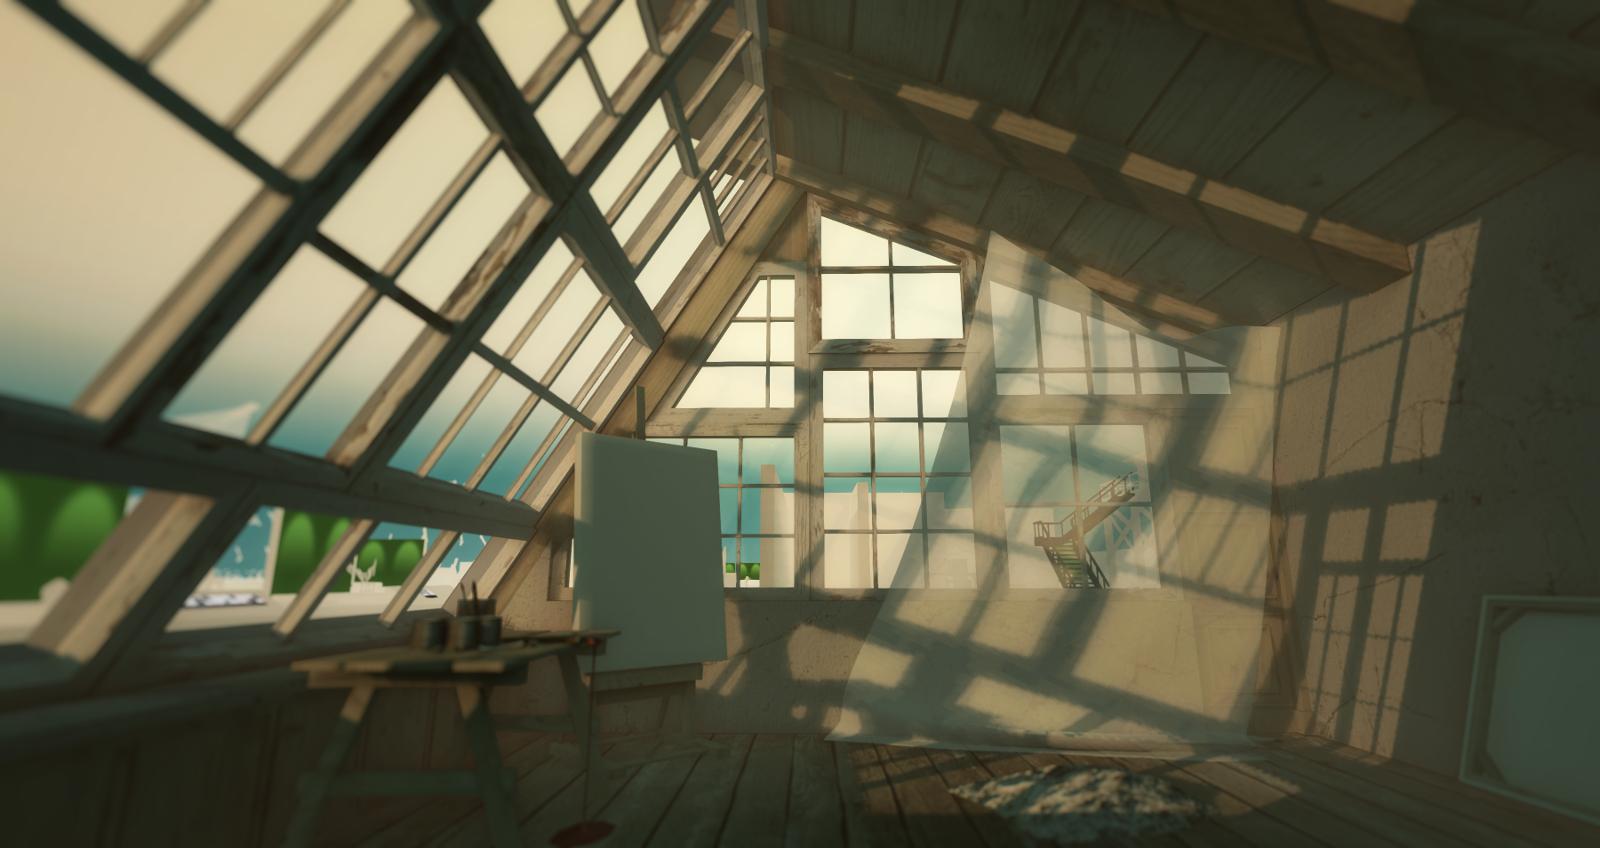 Garden Atelier's interior